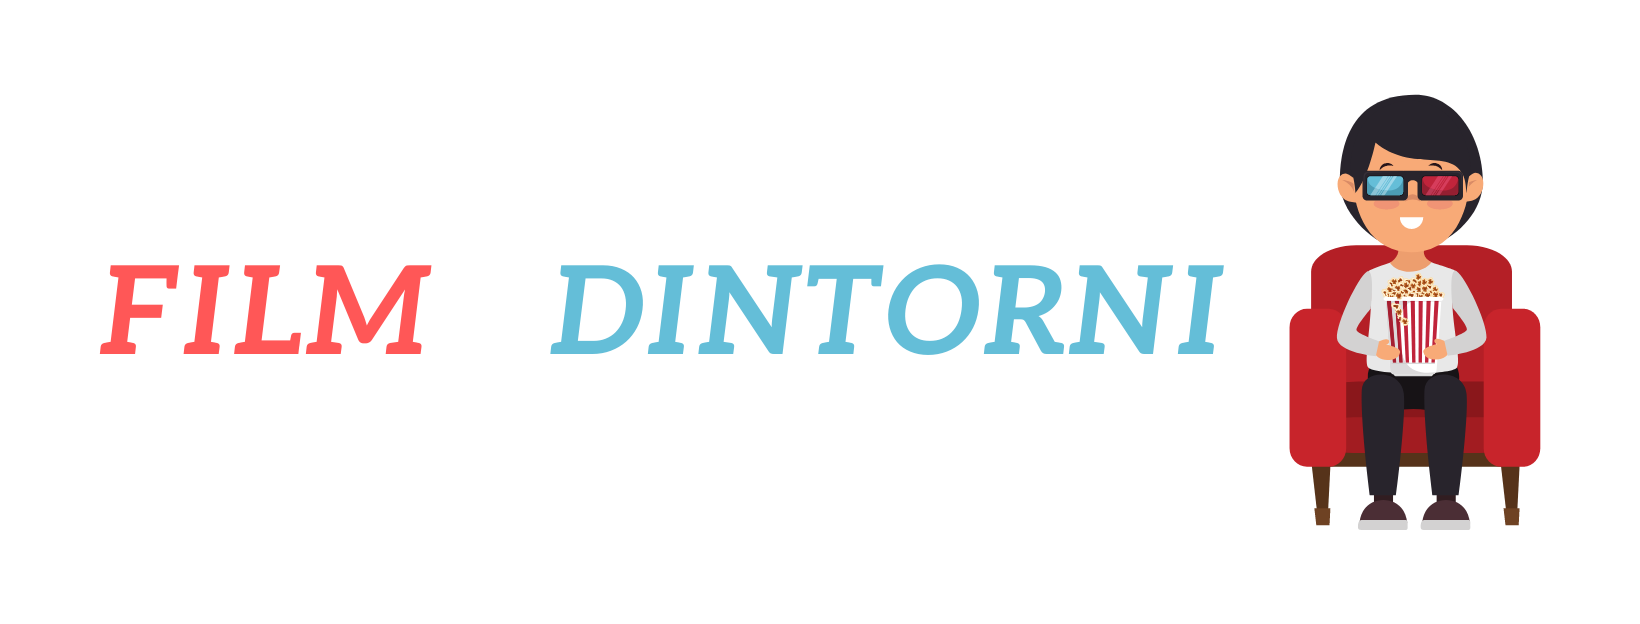 il logo di filmedintorni.it